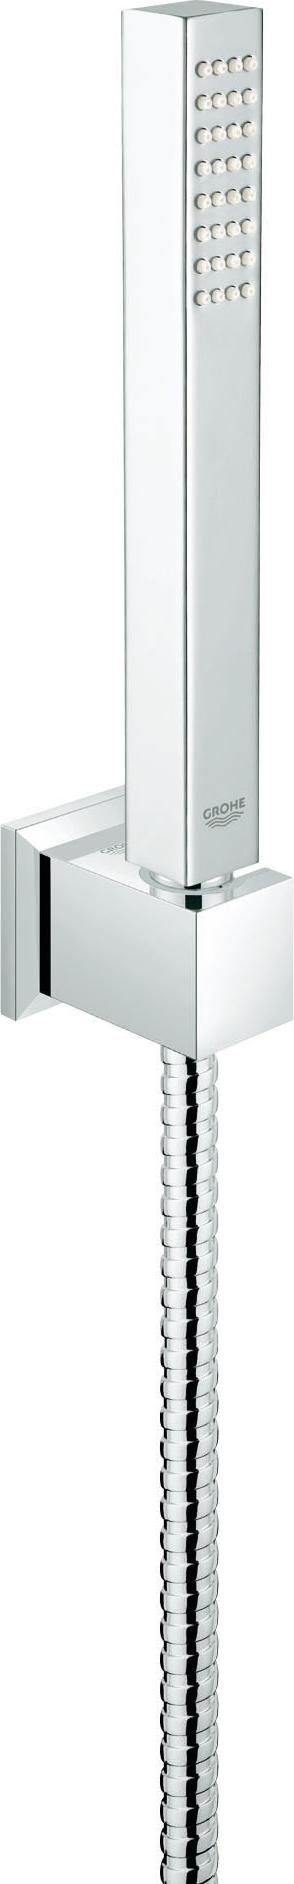 Душевой гарнитур Grohe Cube 27889000